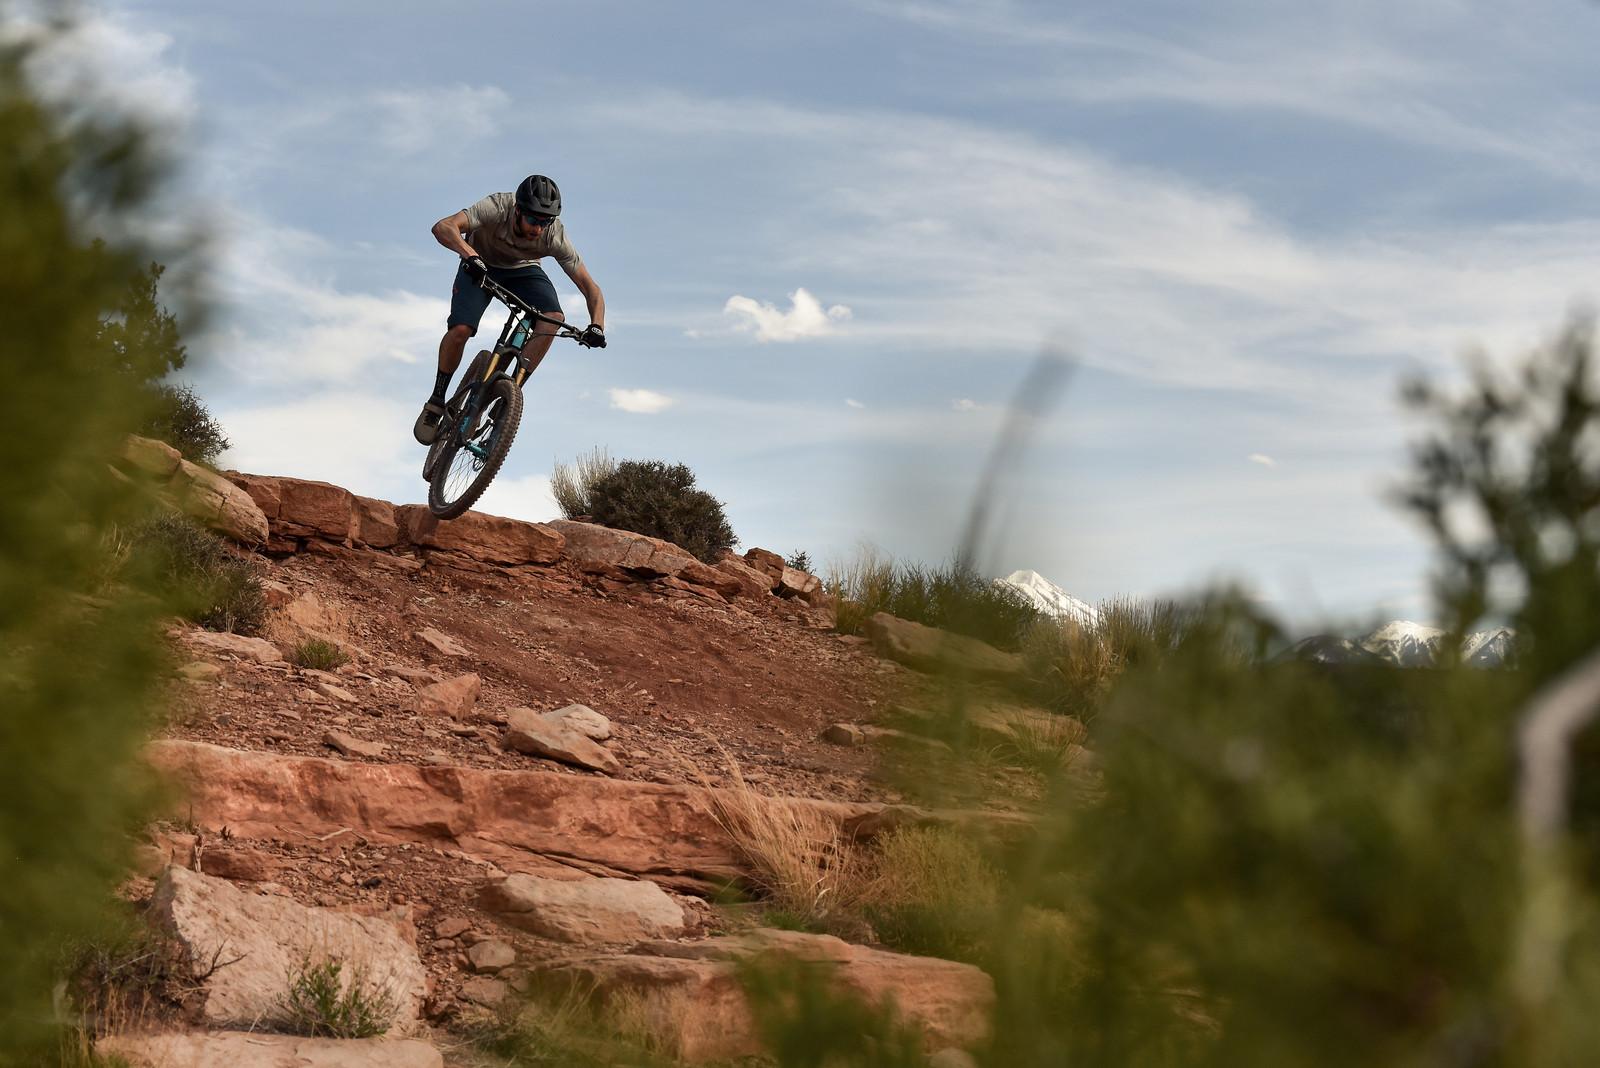 PJR 0967-1 - russellpj - Mountain Biking Pictures - Vital MTB